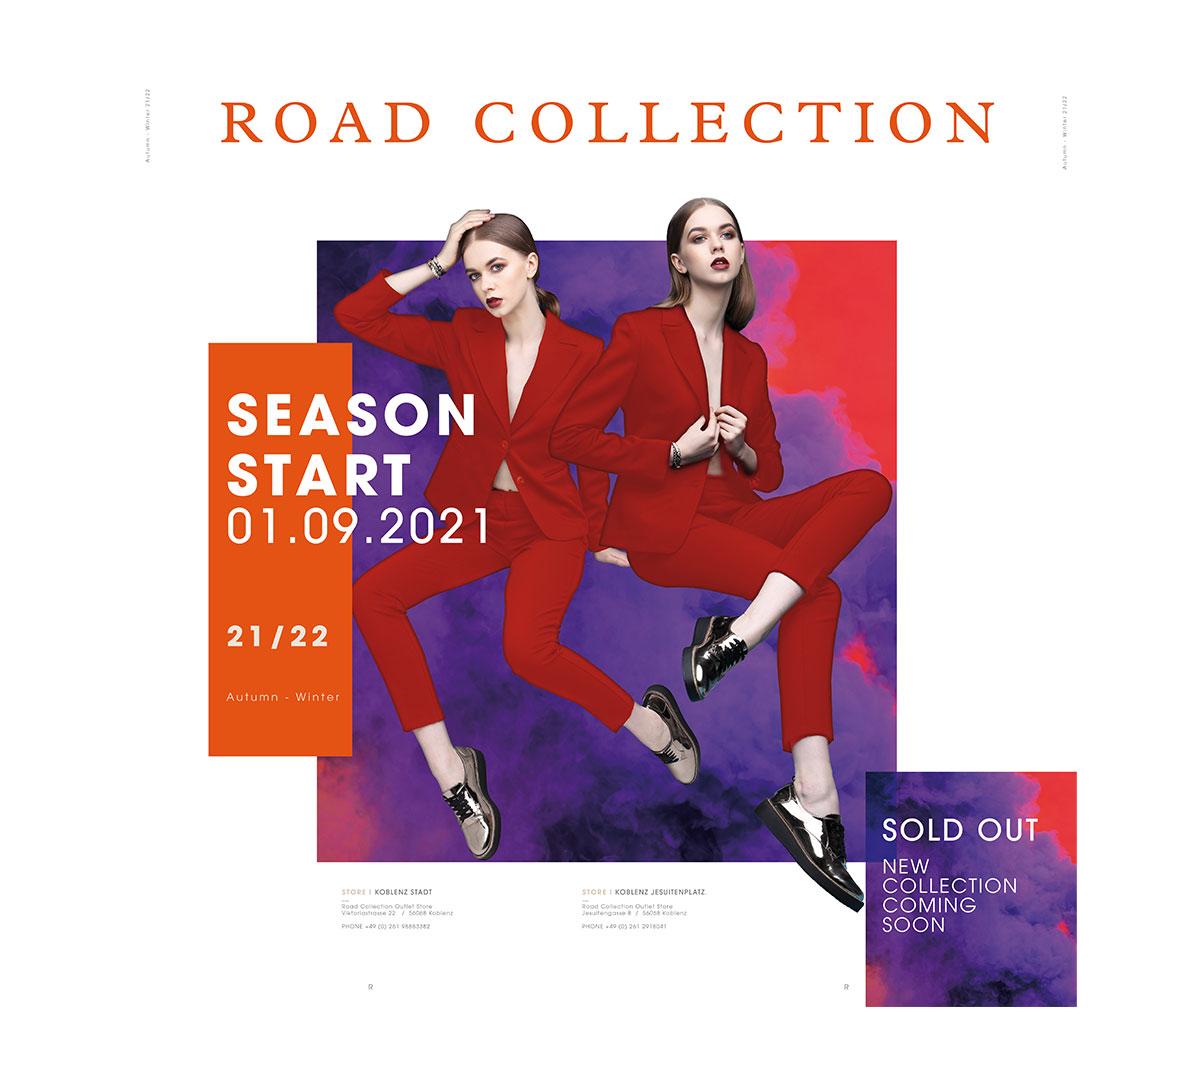 Road Collection / Season Start 21/21 Koblenz